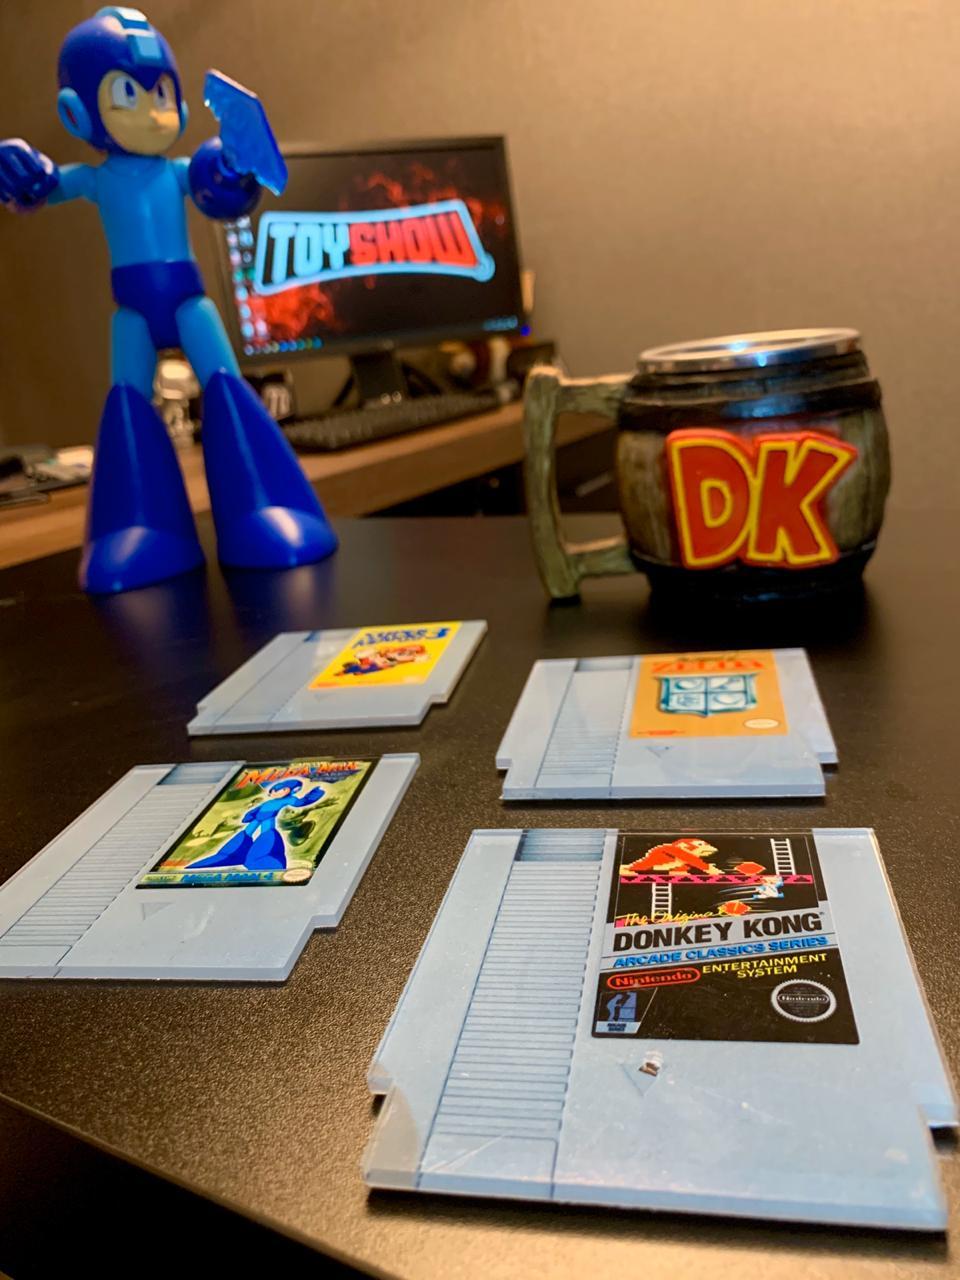 Porta Copos Fitas Super Mario 3, Mega Man, Donkey Kong e Zelda: Nintendo - Set com 4